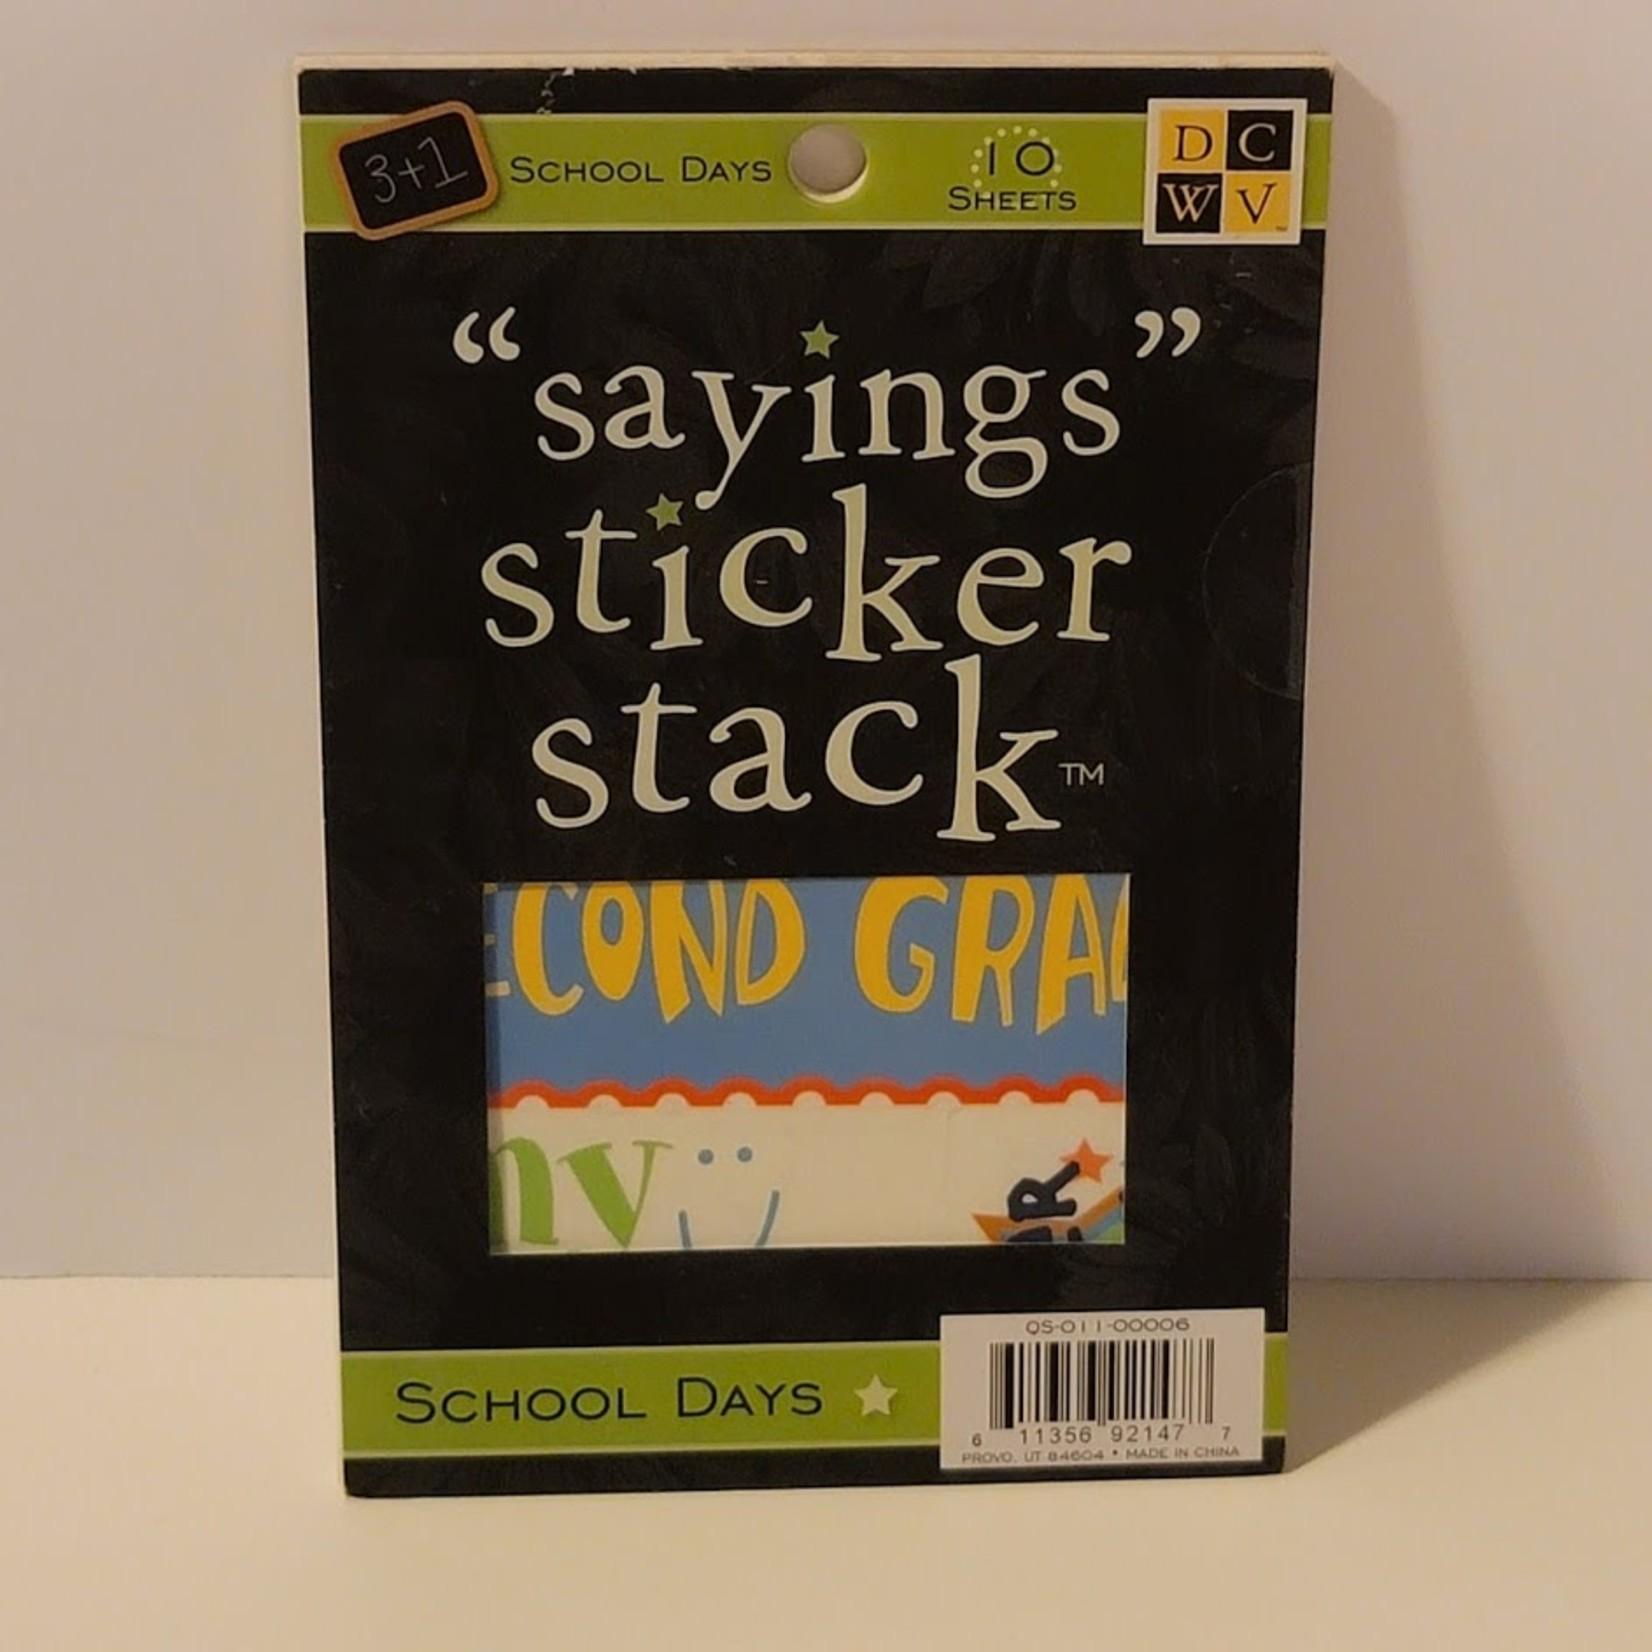 DCWV - Sayings Sticker Stack - School Days